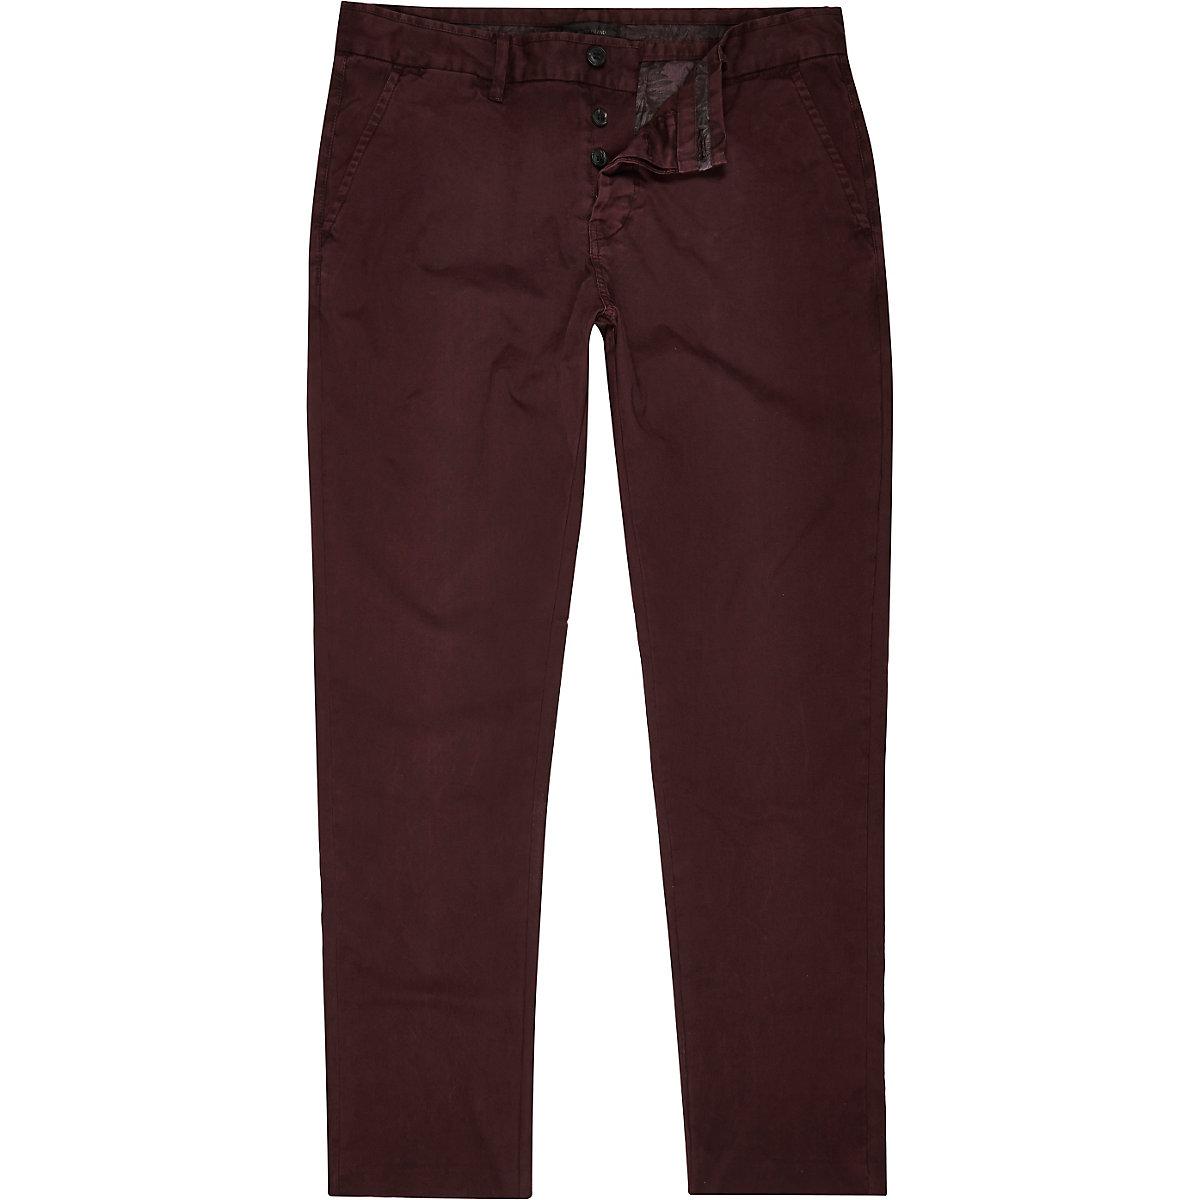 Pantalon chino rouge baie coupe slim